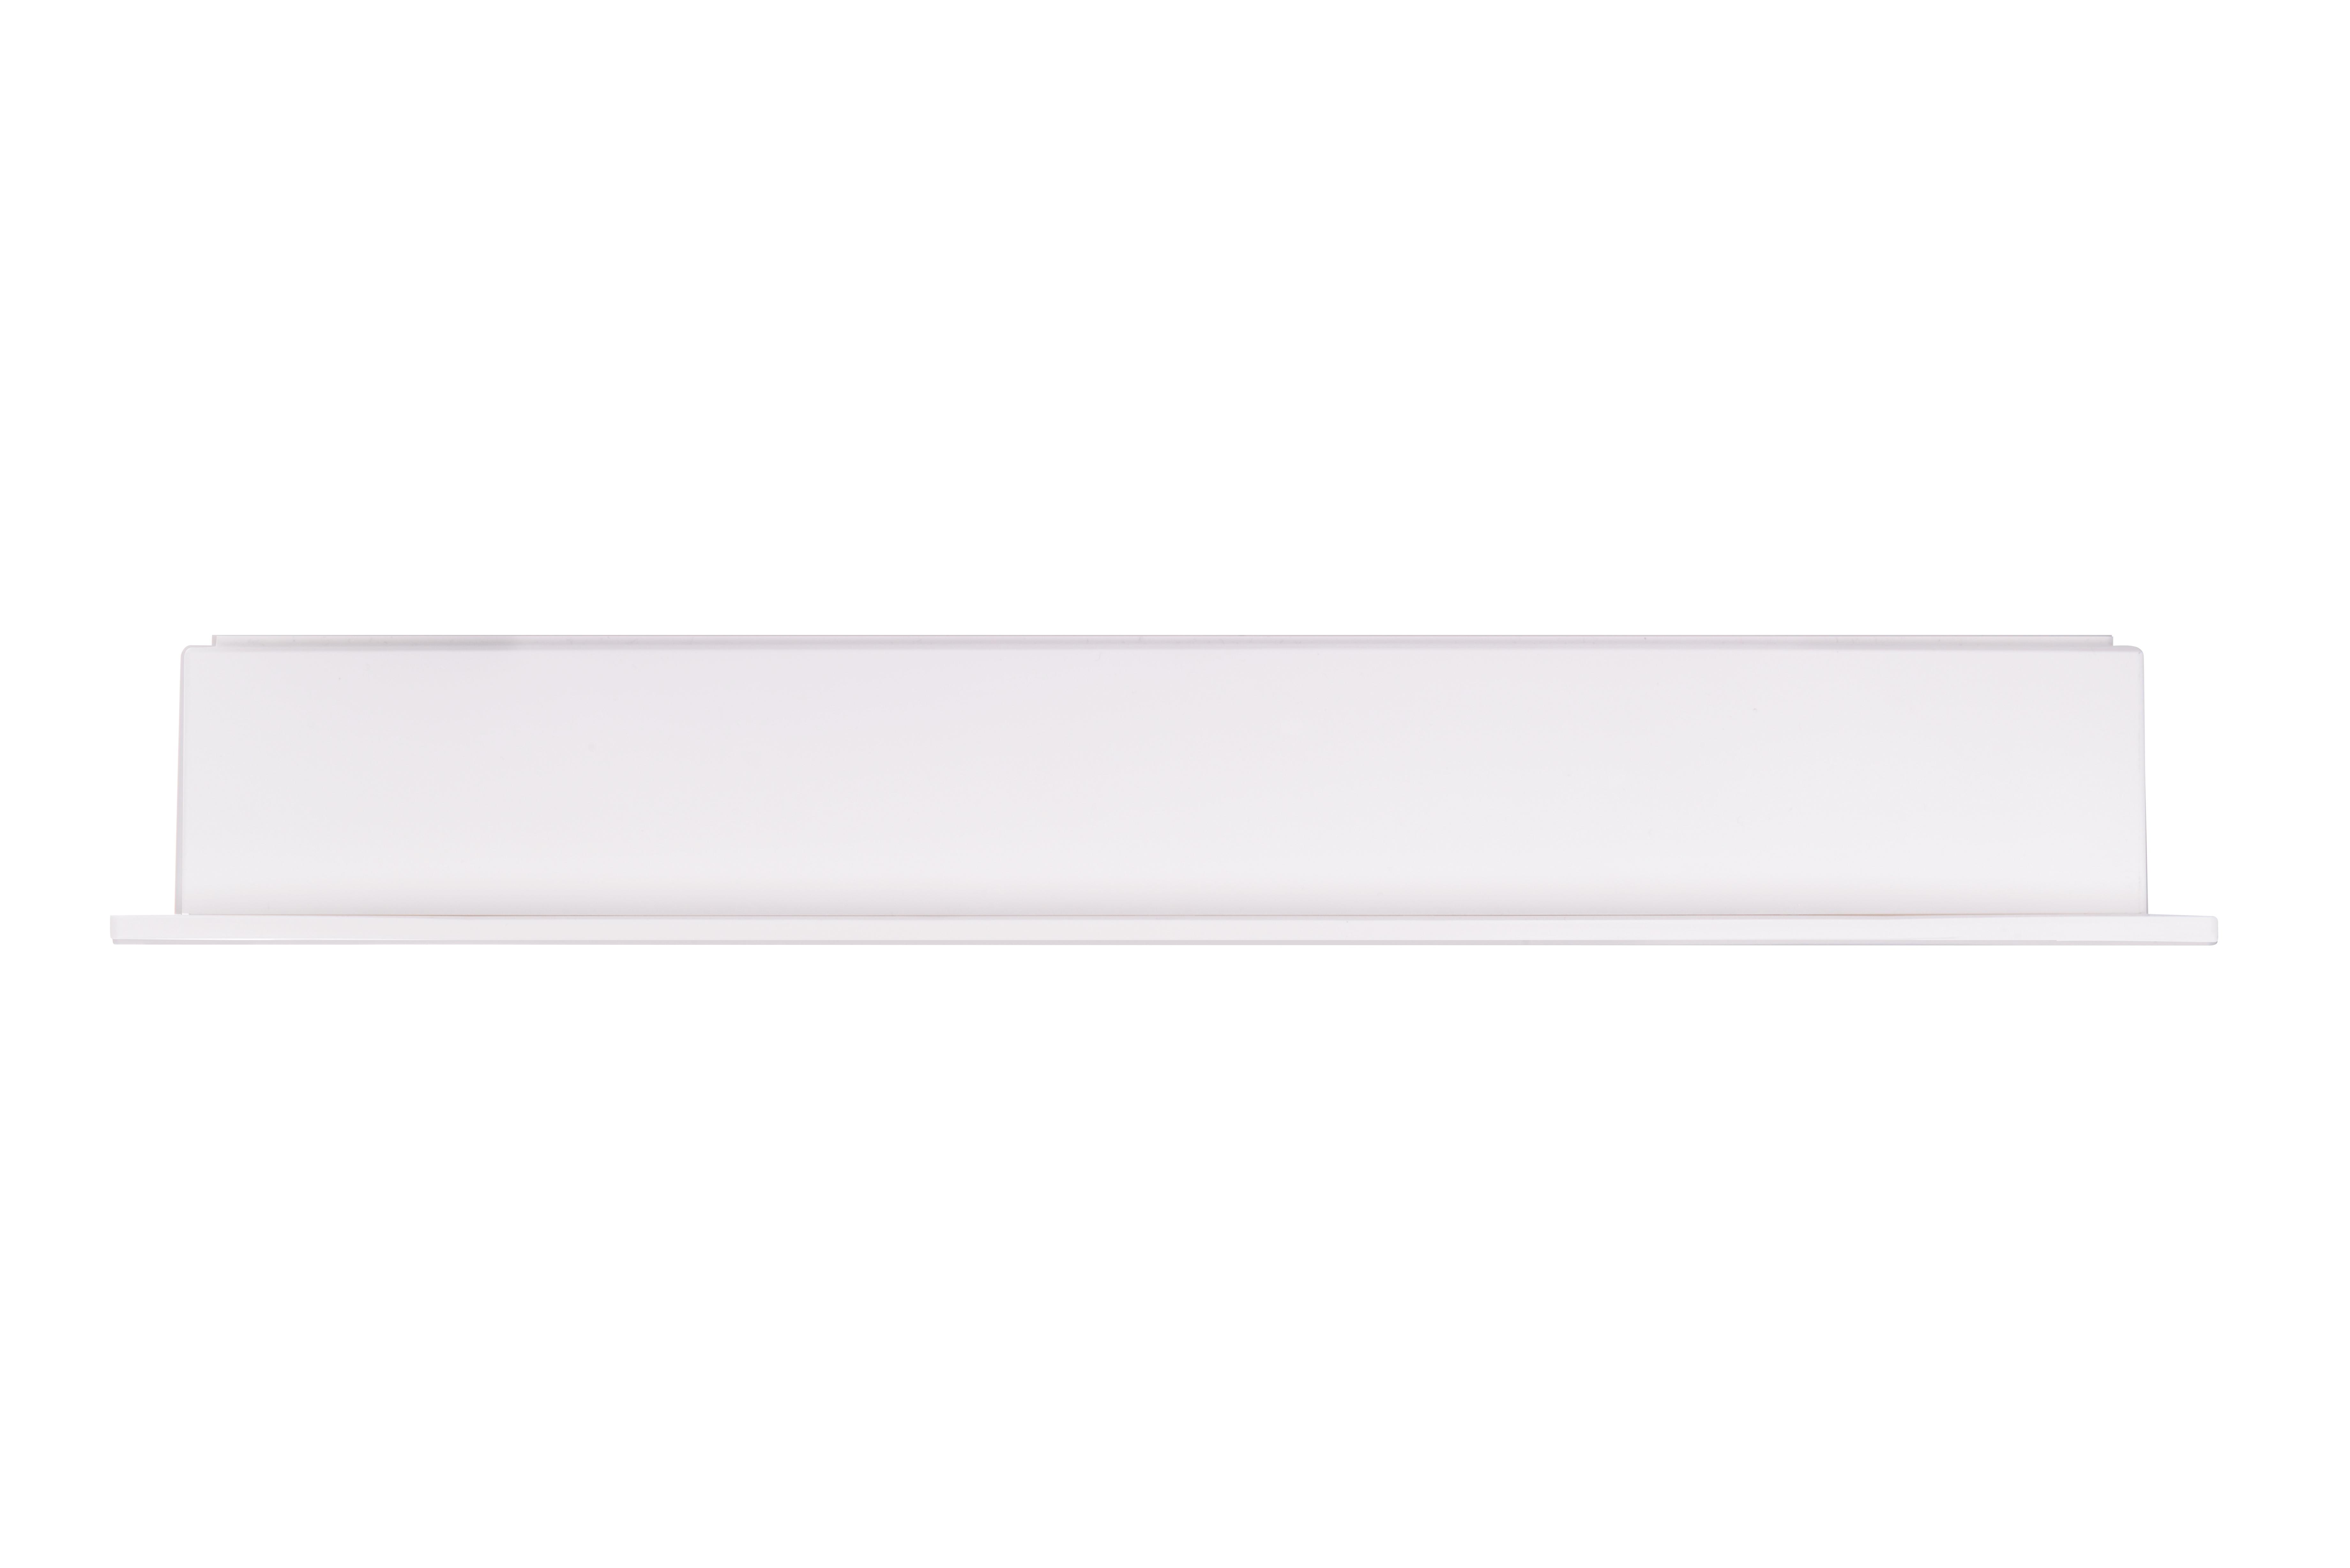 Lampa emergenta led Intelight 94767   3h nementinut test automat 5